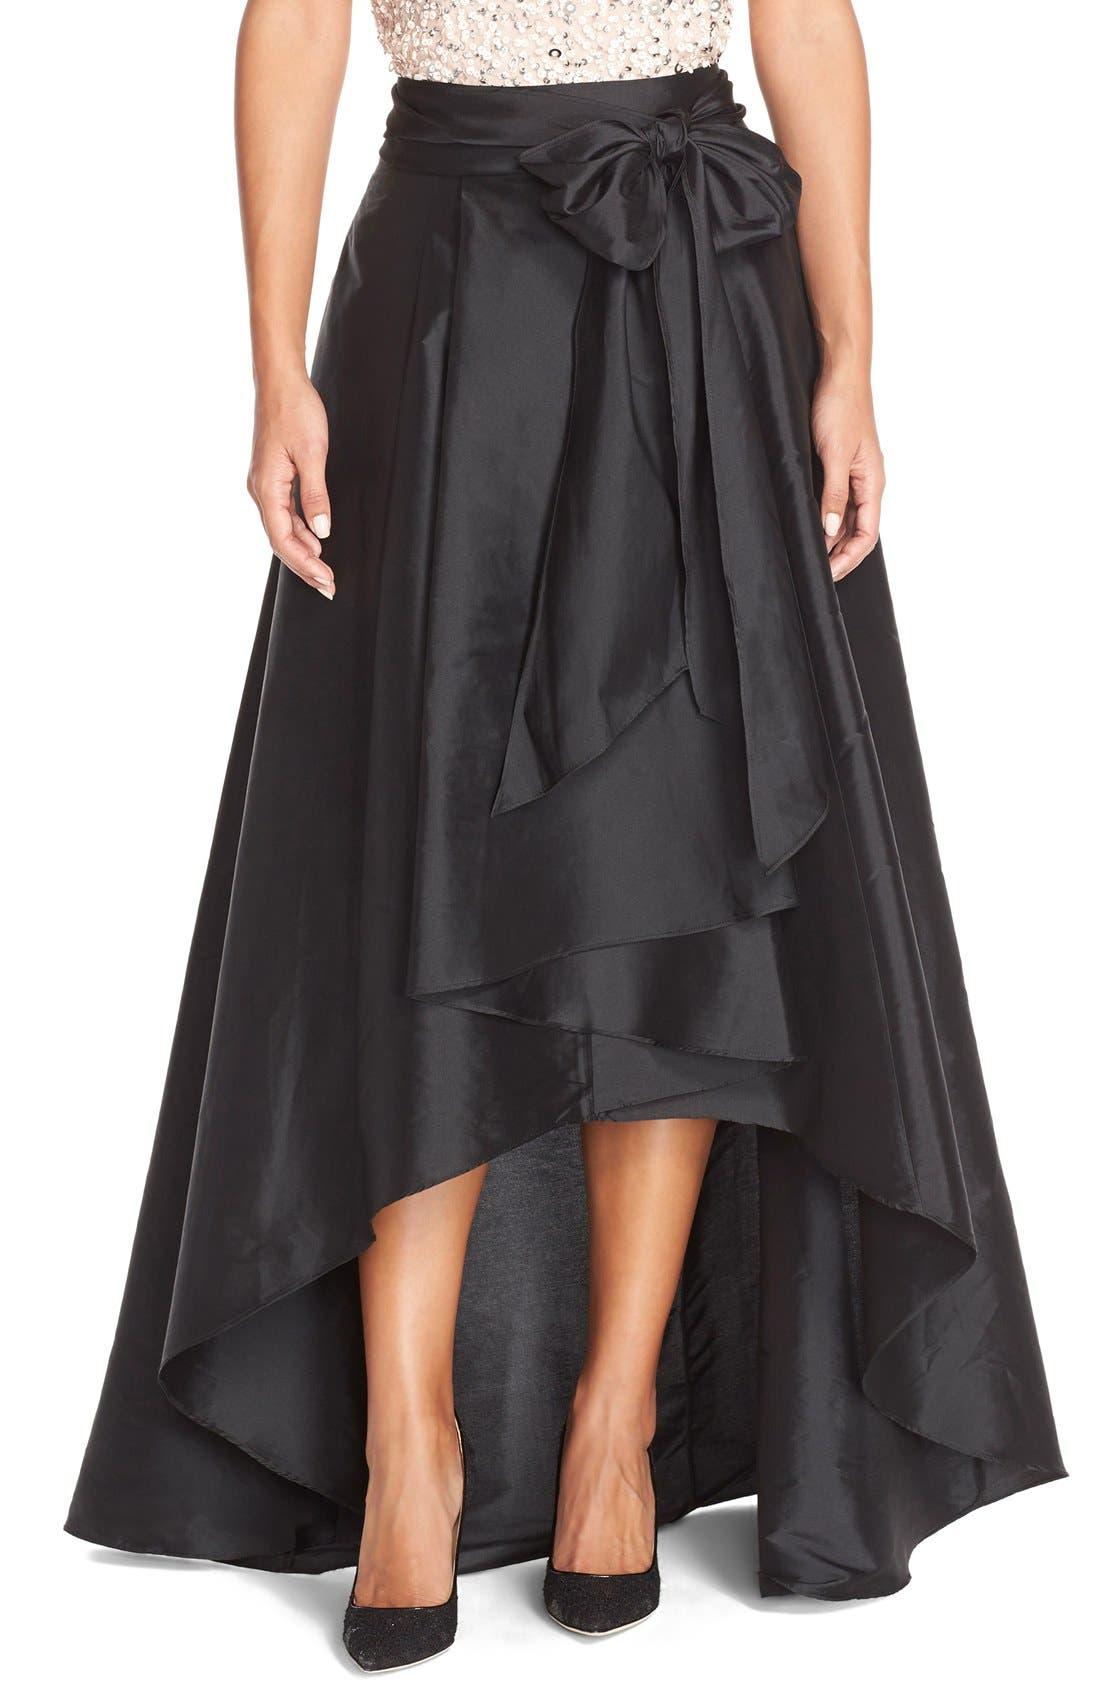 ADRIANNA PAPELL, High/Low Taffeta Ball Skirt, Main thumbnail 1, color, 001